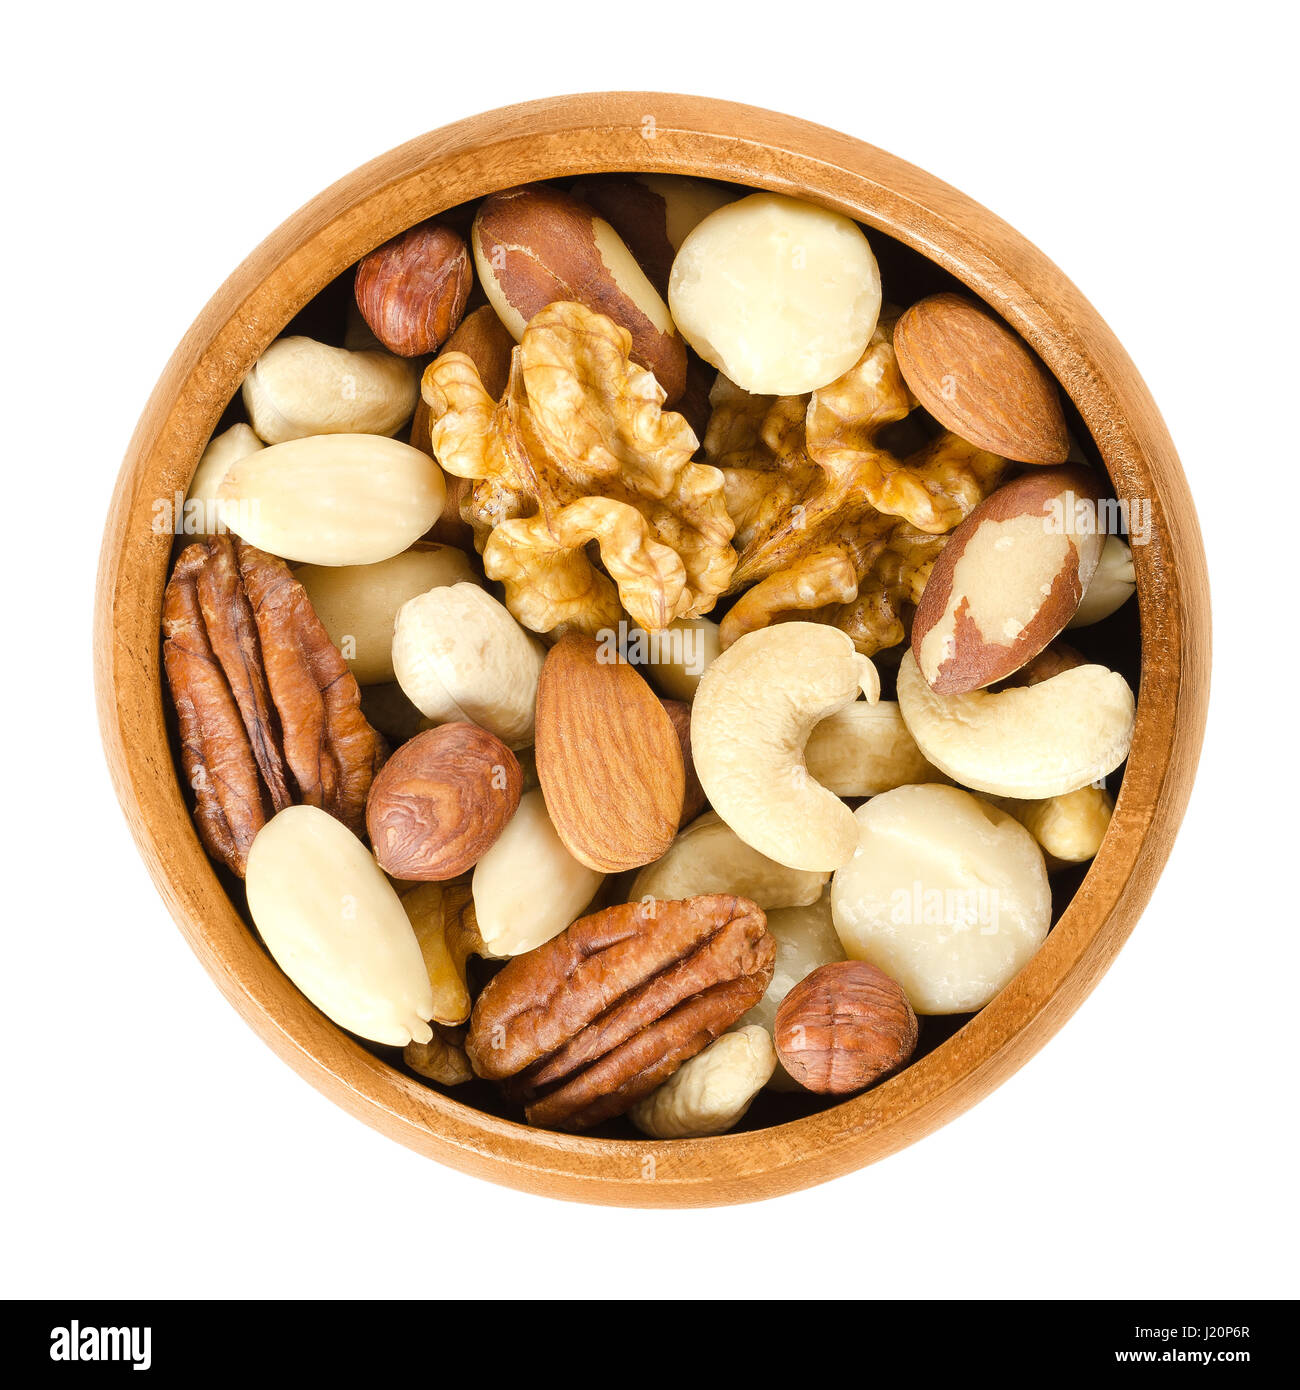 Are brazil nut shells radioactive dating 6